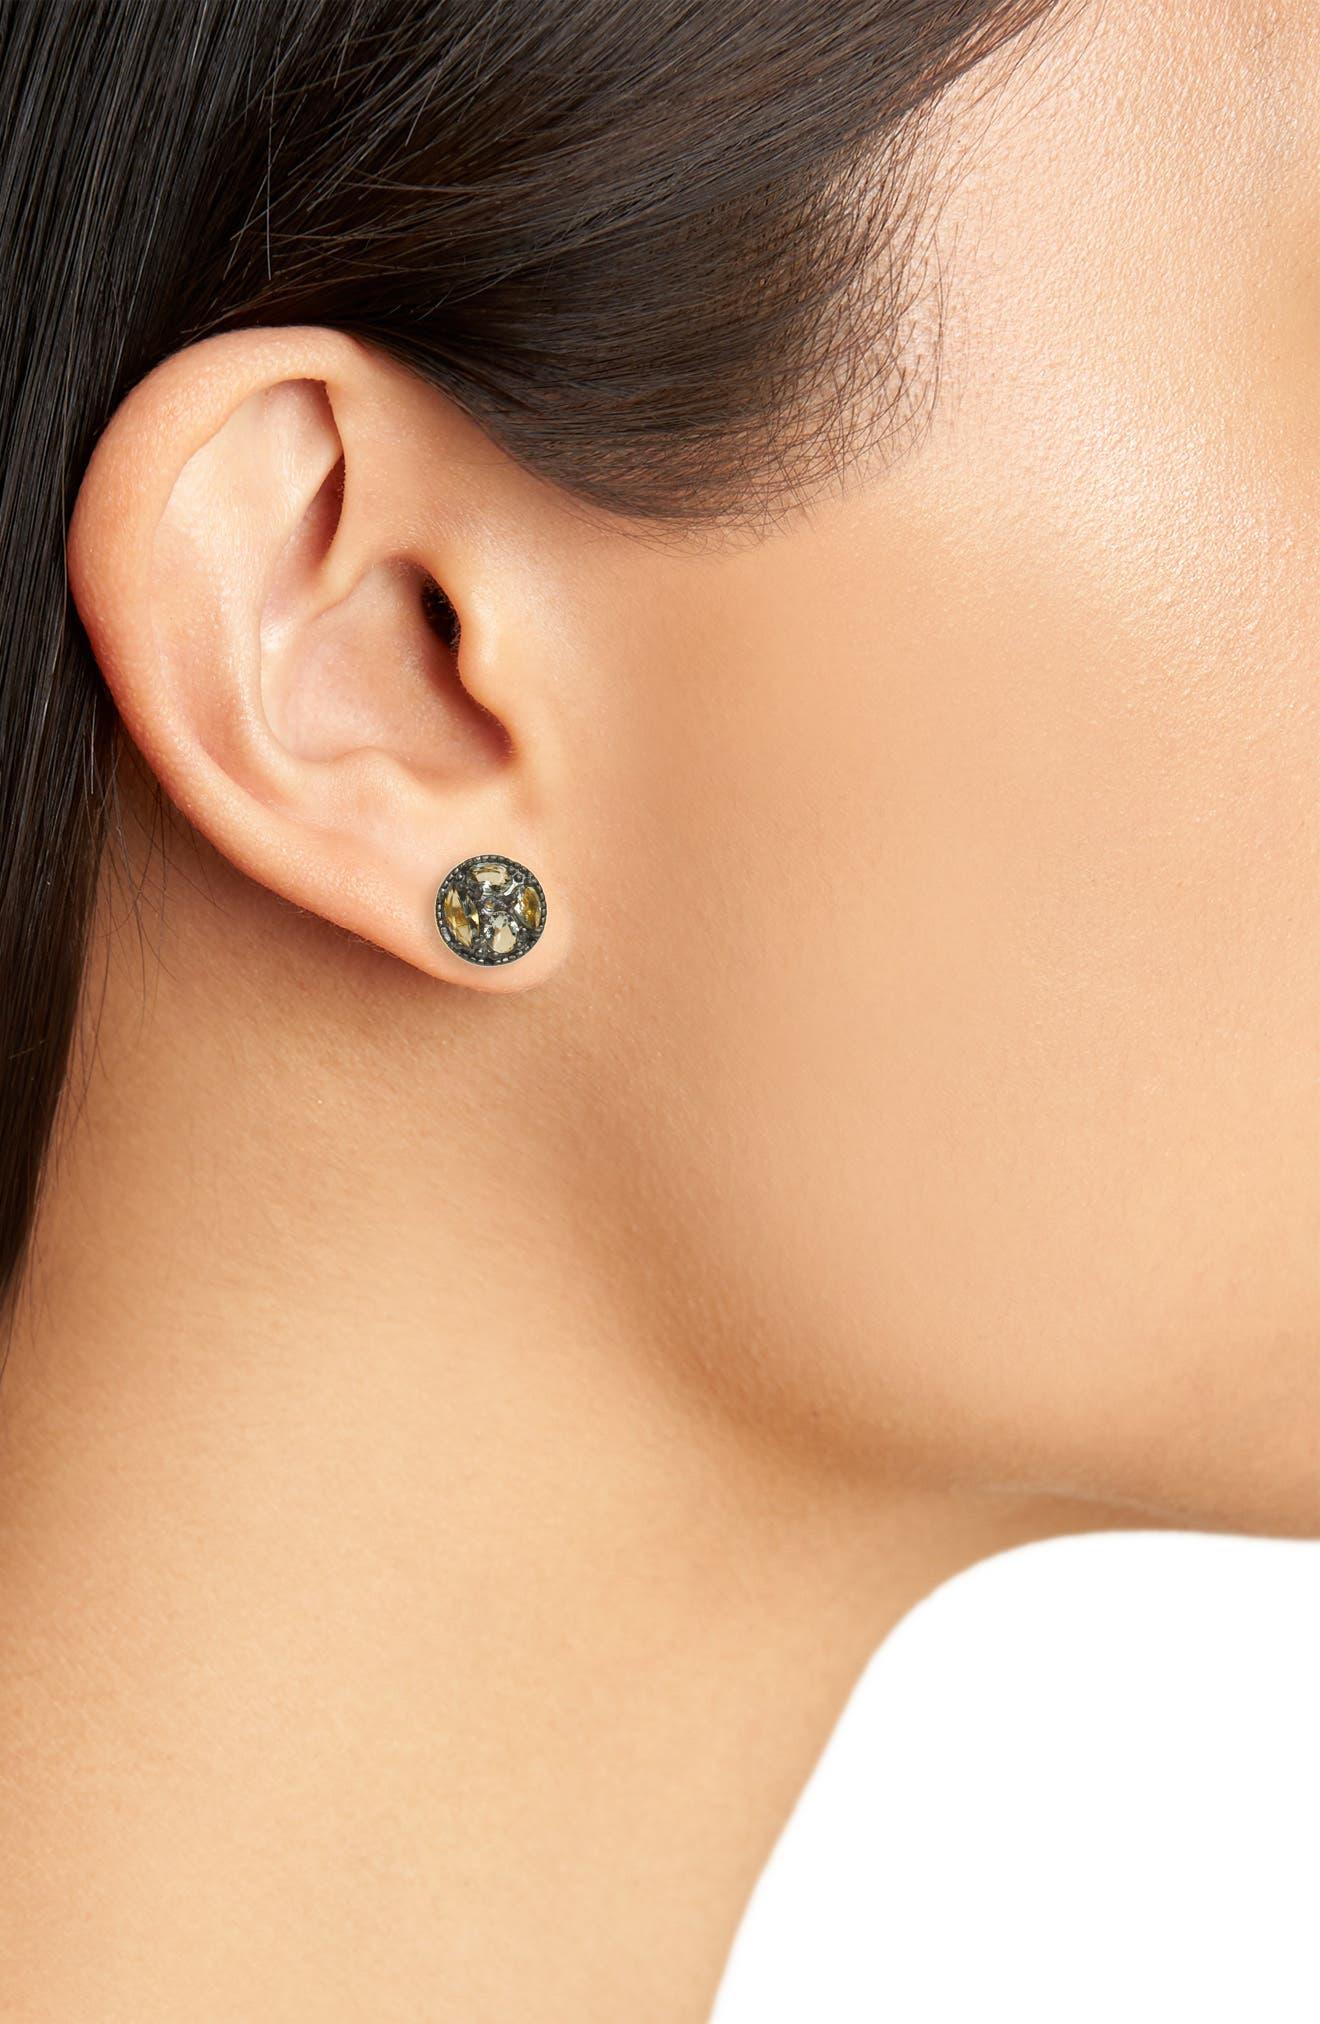 Rose Dor Small Disc Earrings,                             Alternate thumbnail 2, color,                             Black Rhodium/ Gold